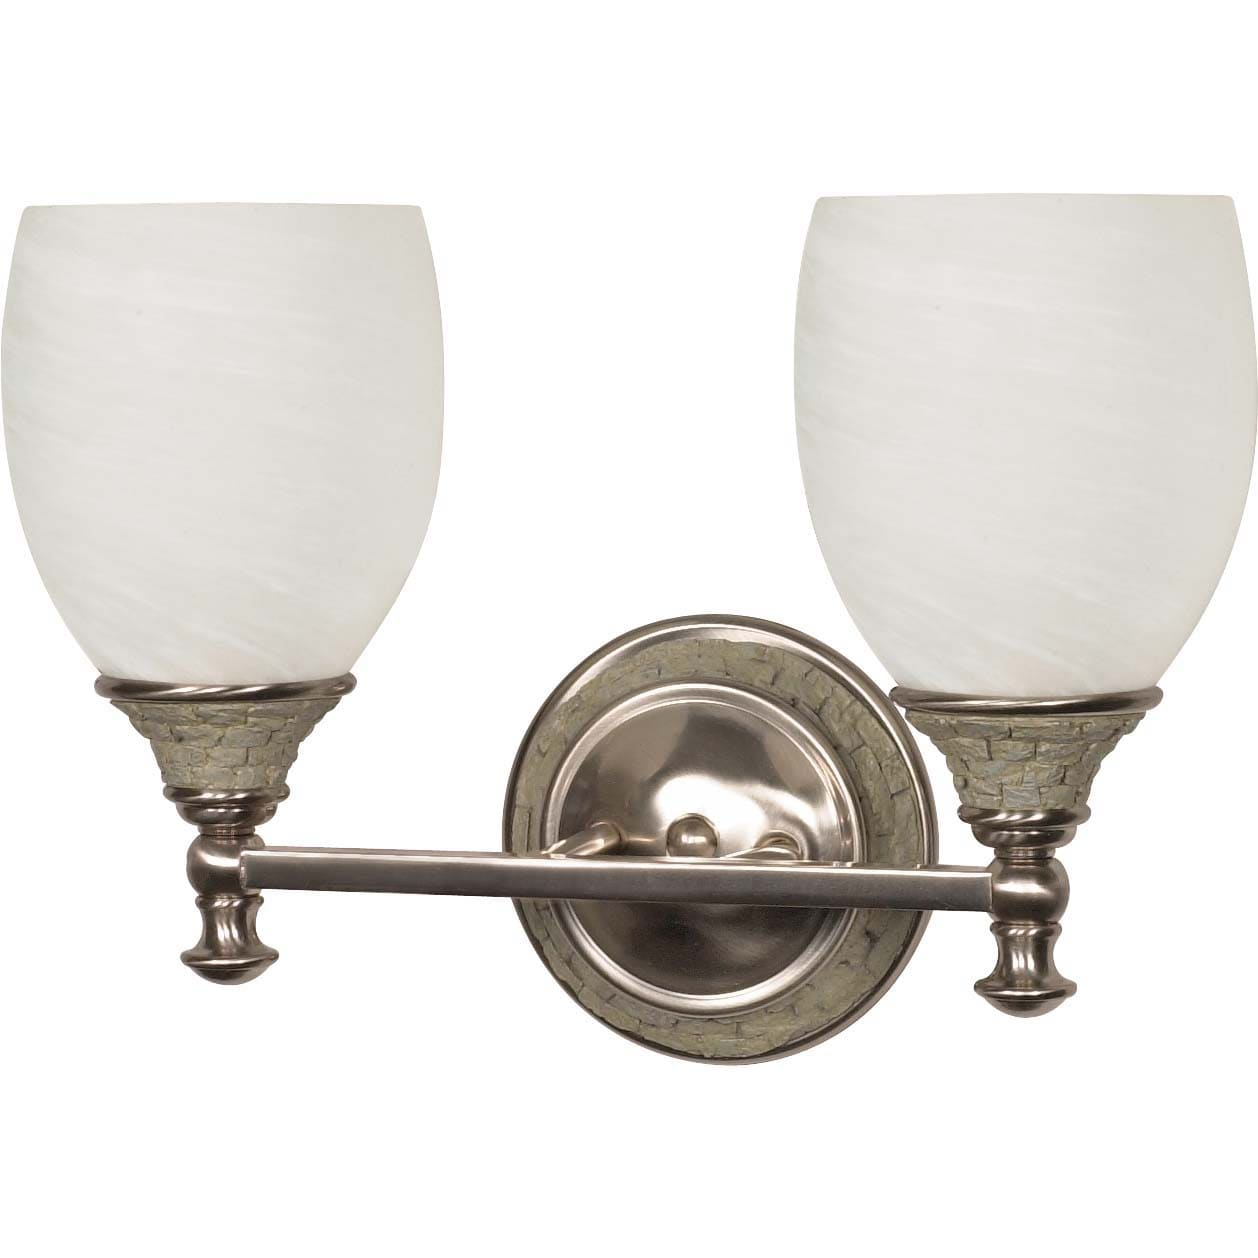 Rockport Milano Alabaster Glass Brushed Nickel 2-Light Vanity Wall Sconce